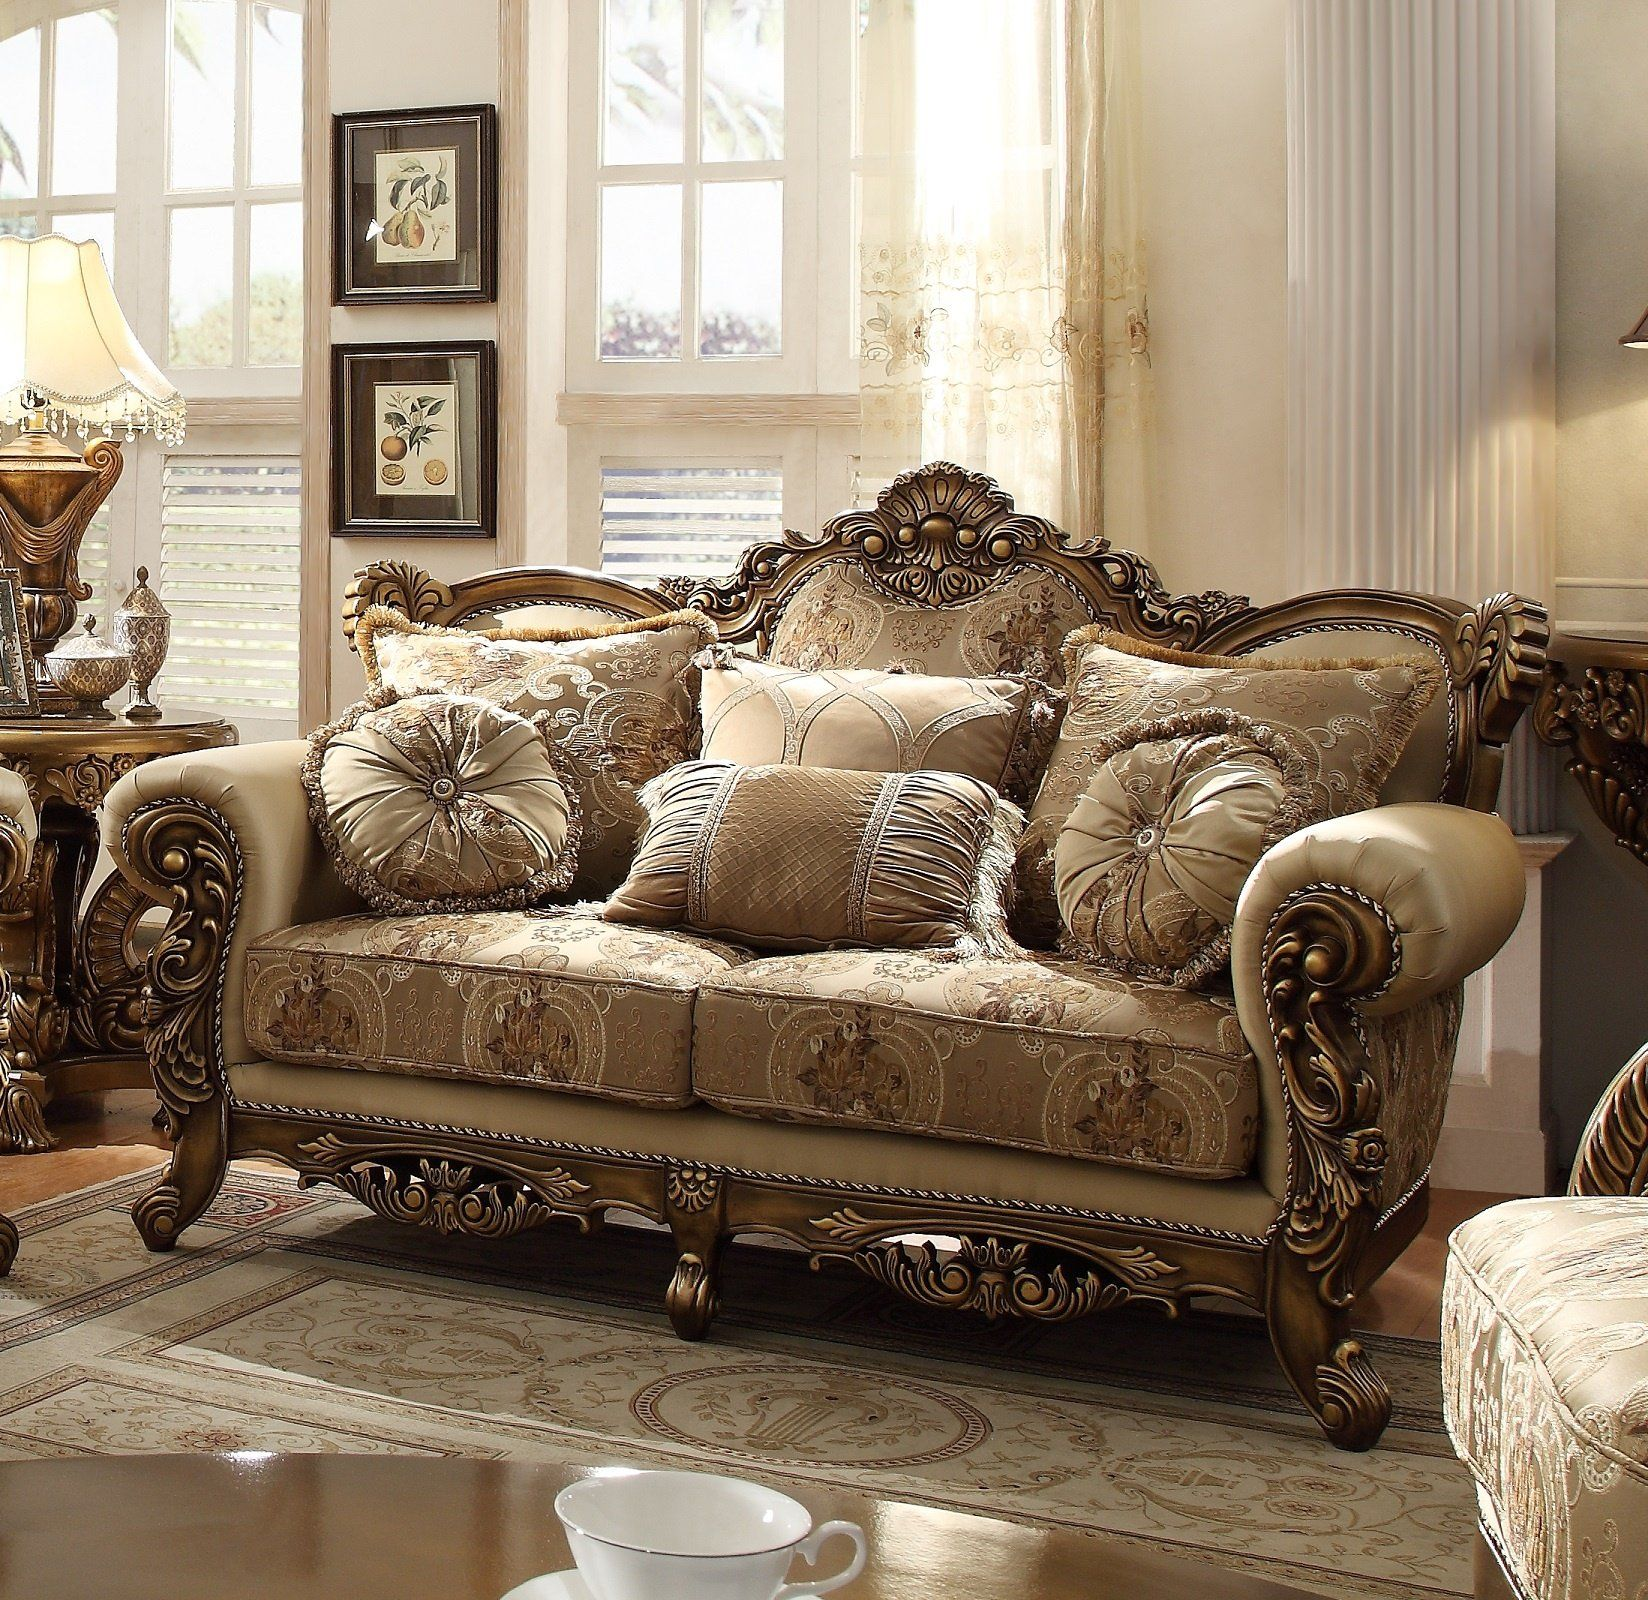 Hd 506 Living Room Collectionloveseat In 2021 Queen Anne Living Room Furniture Classy Living Room Furniture Homey Living Room